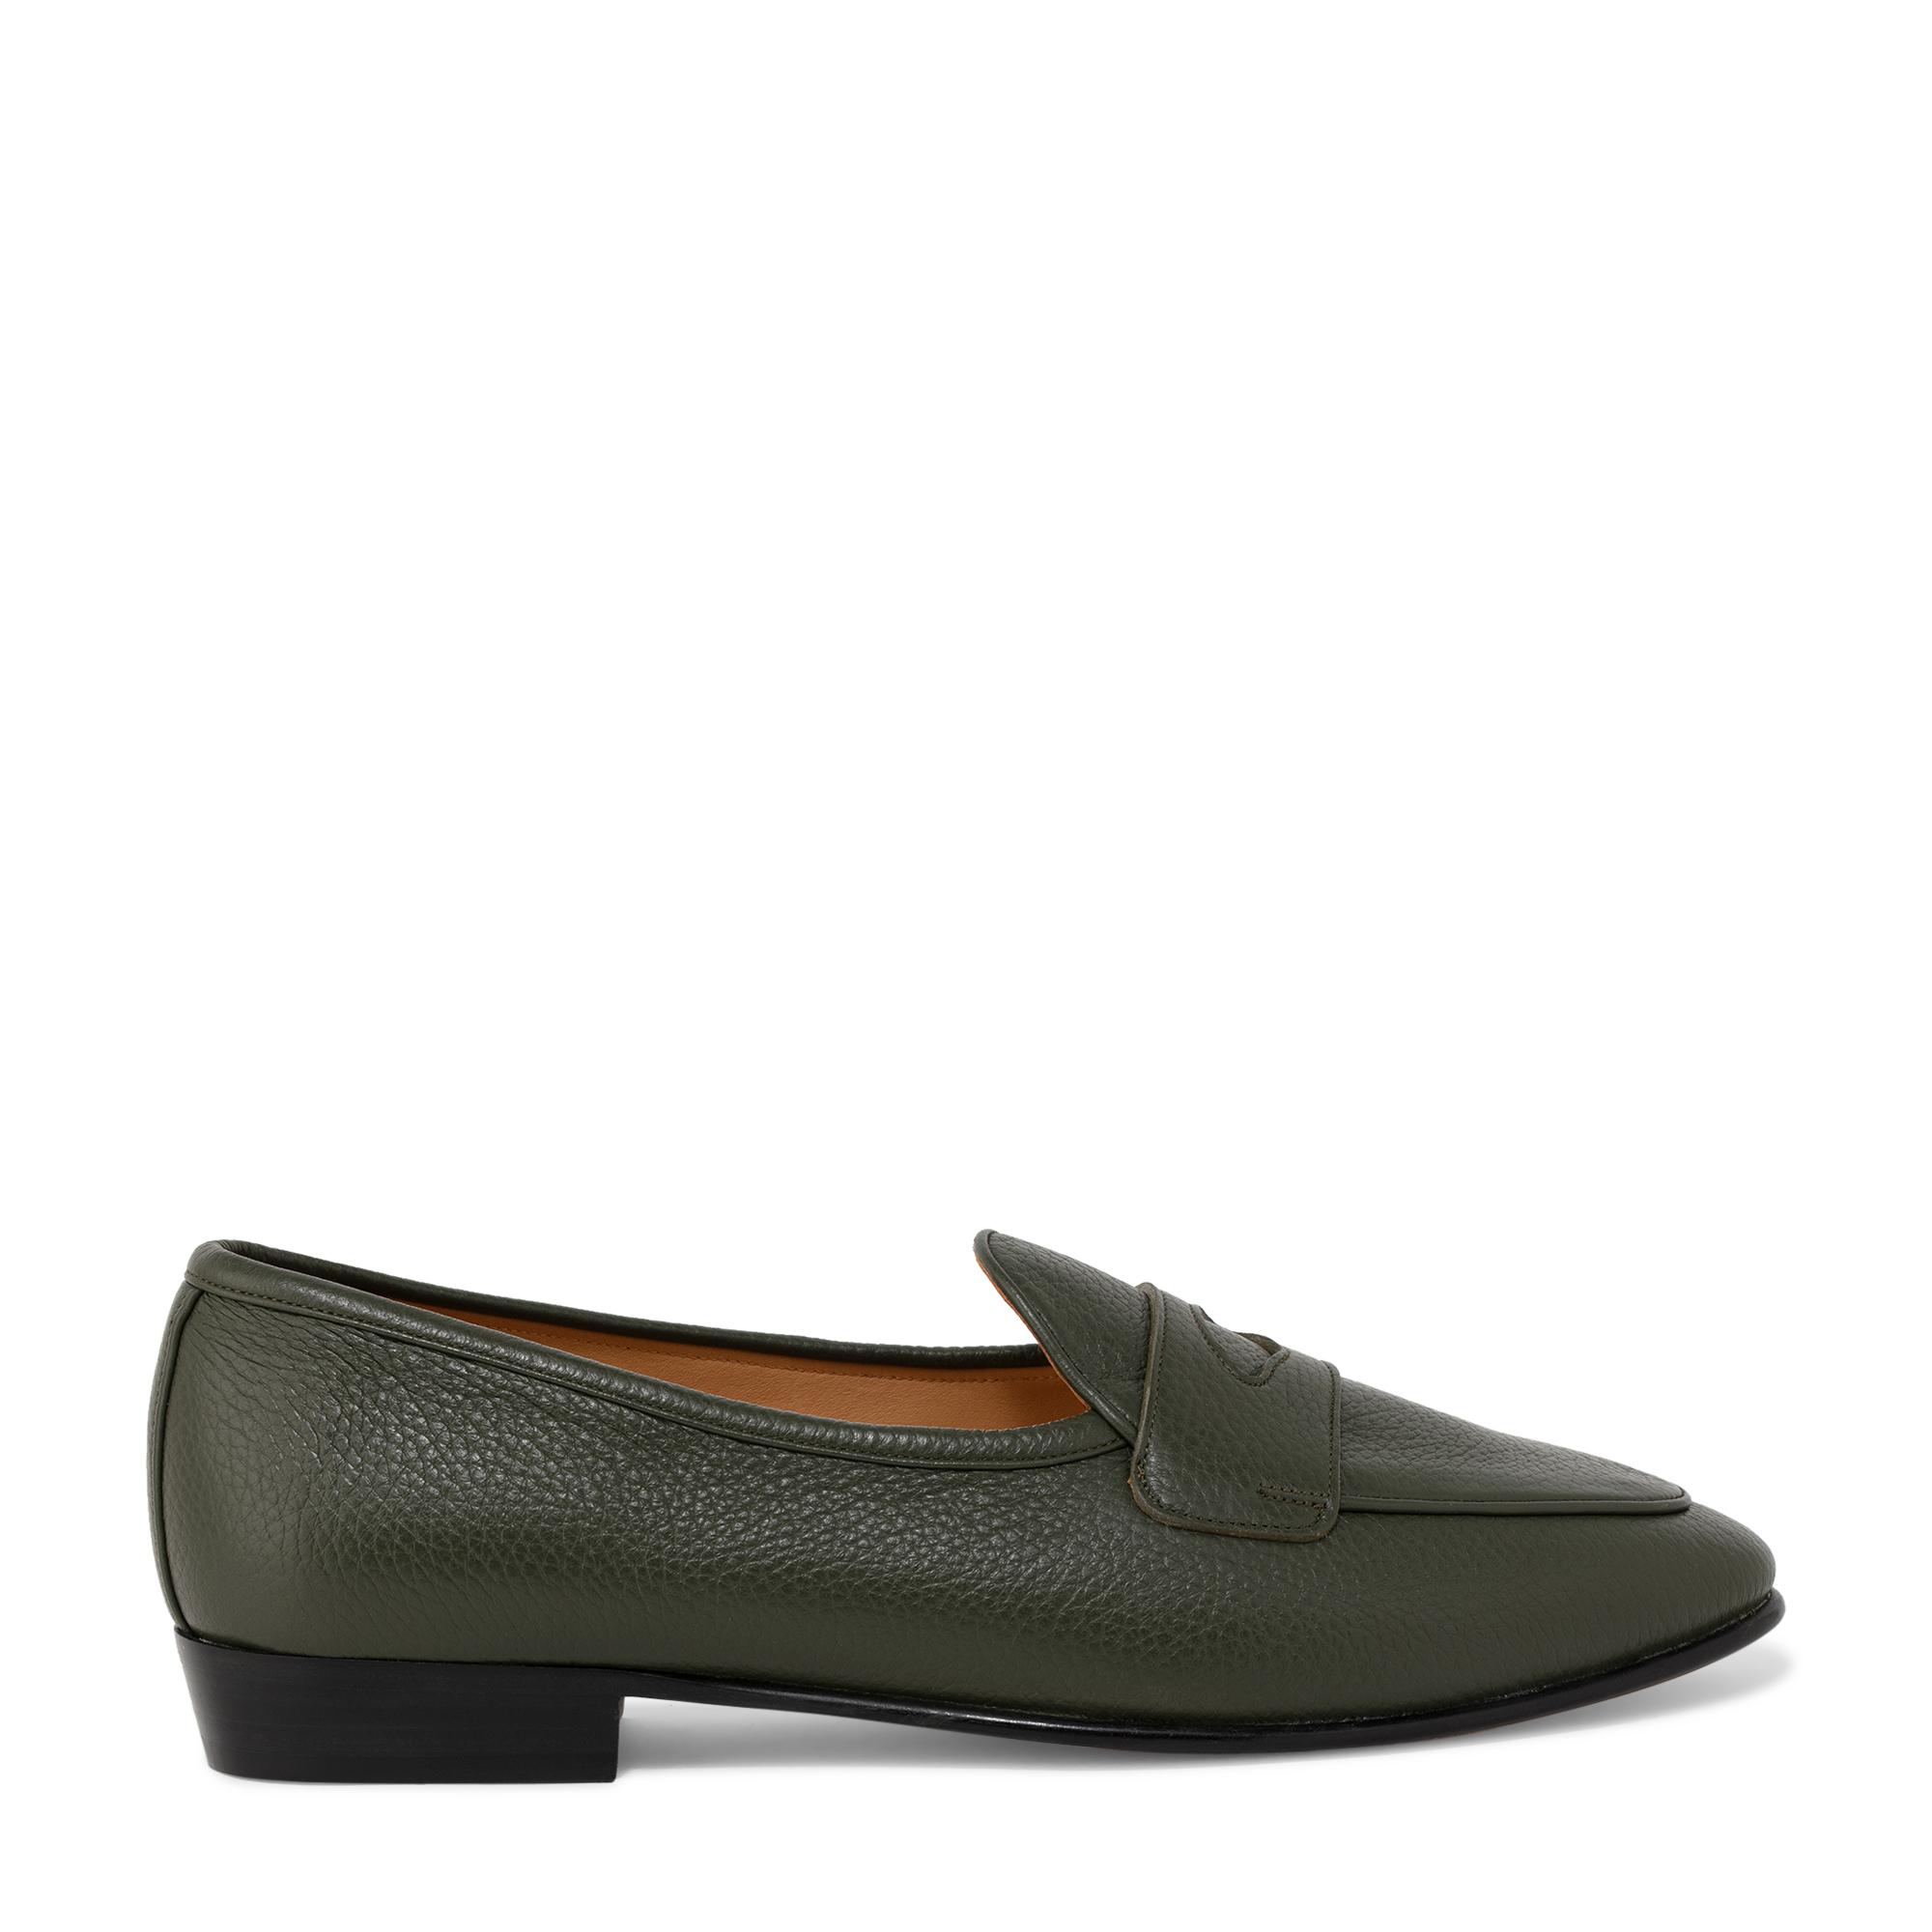 Sagan Classic Gingko loafers